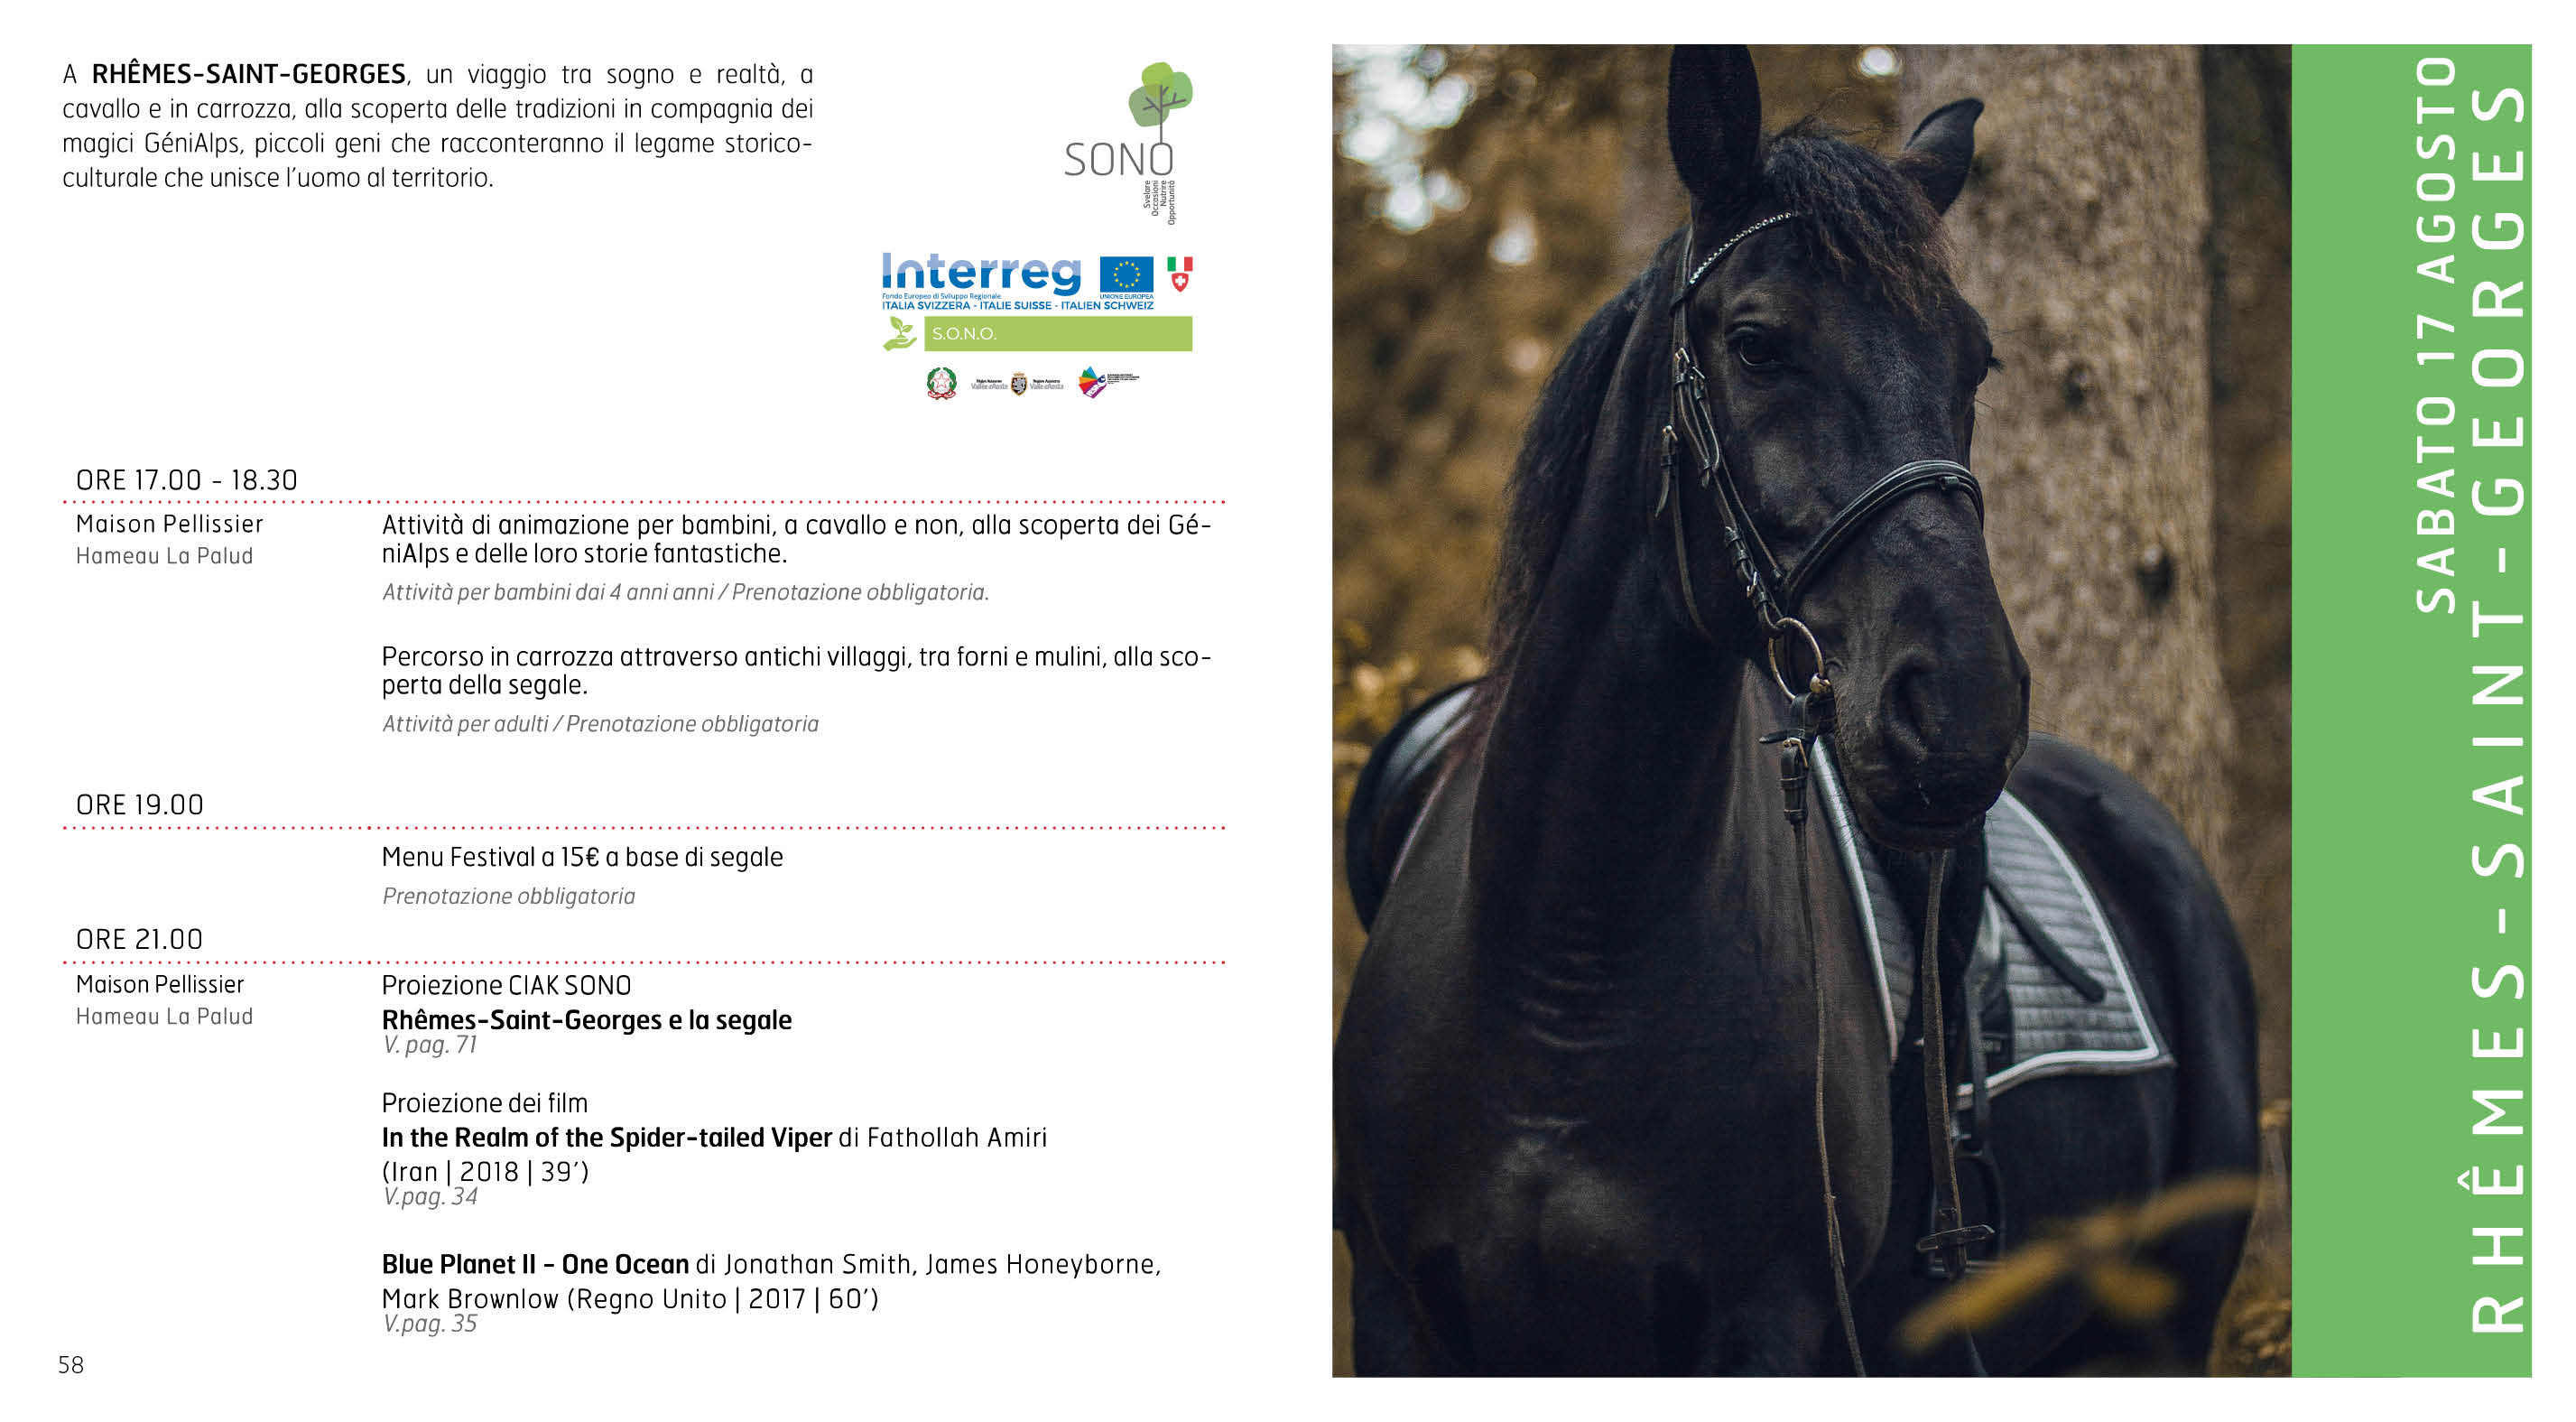 GPFF22 Programma Rhemes-Saint-Georges